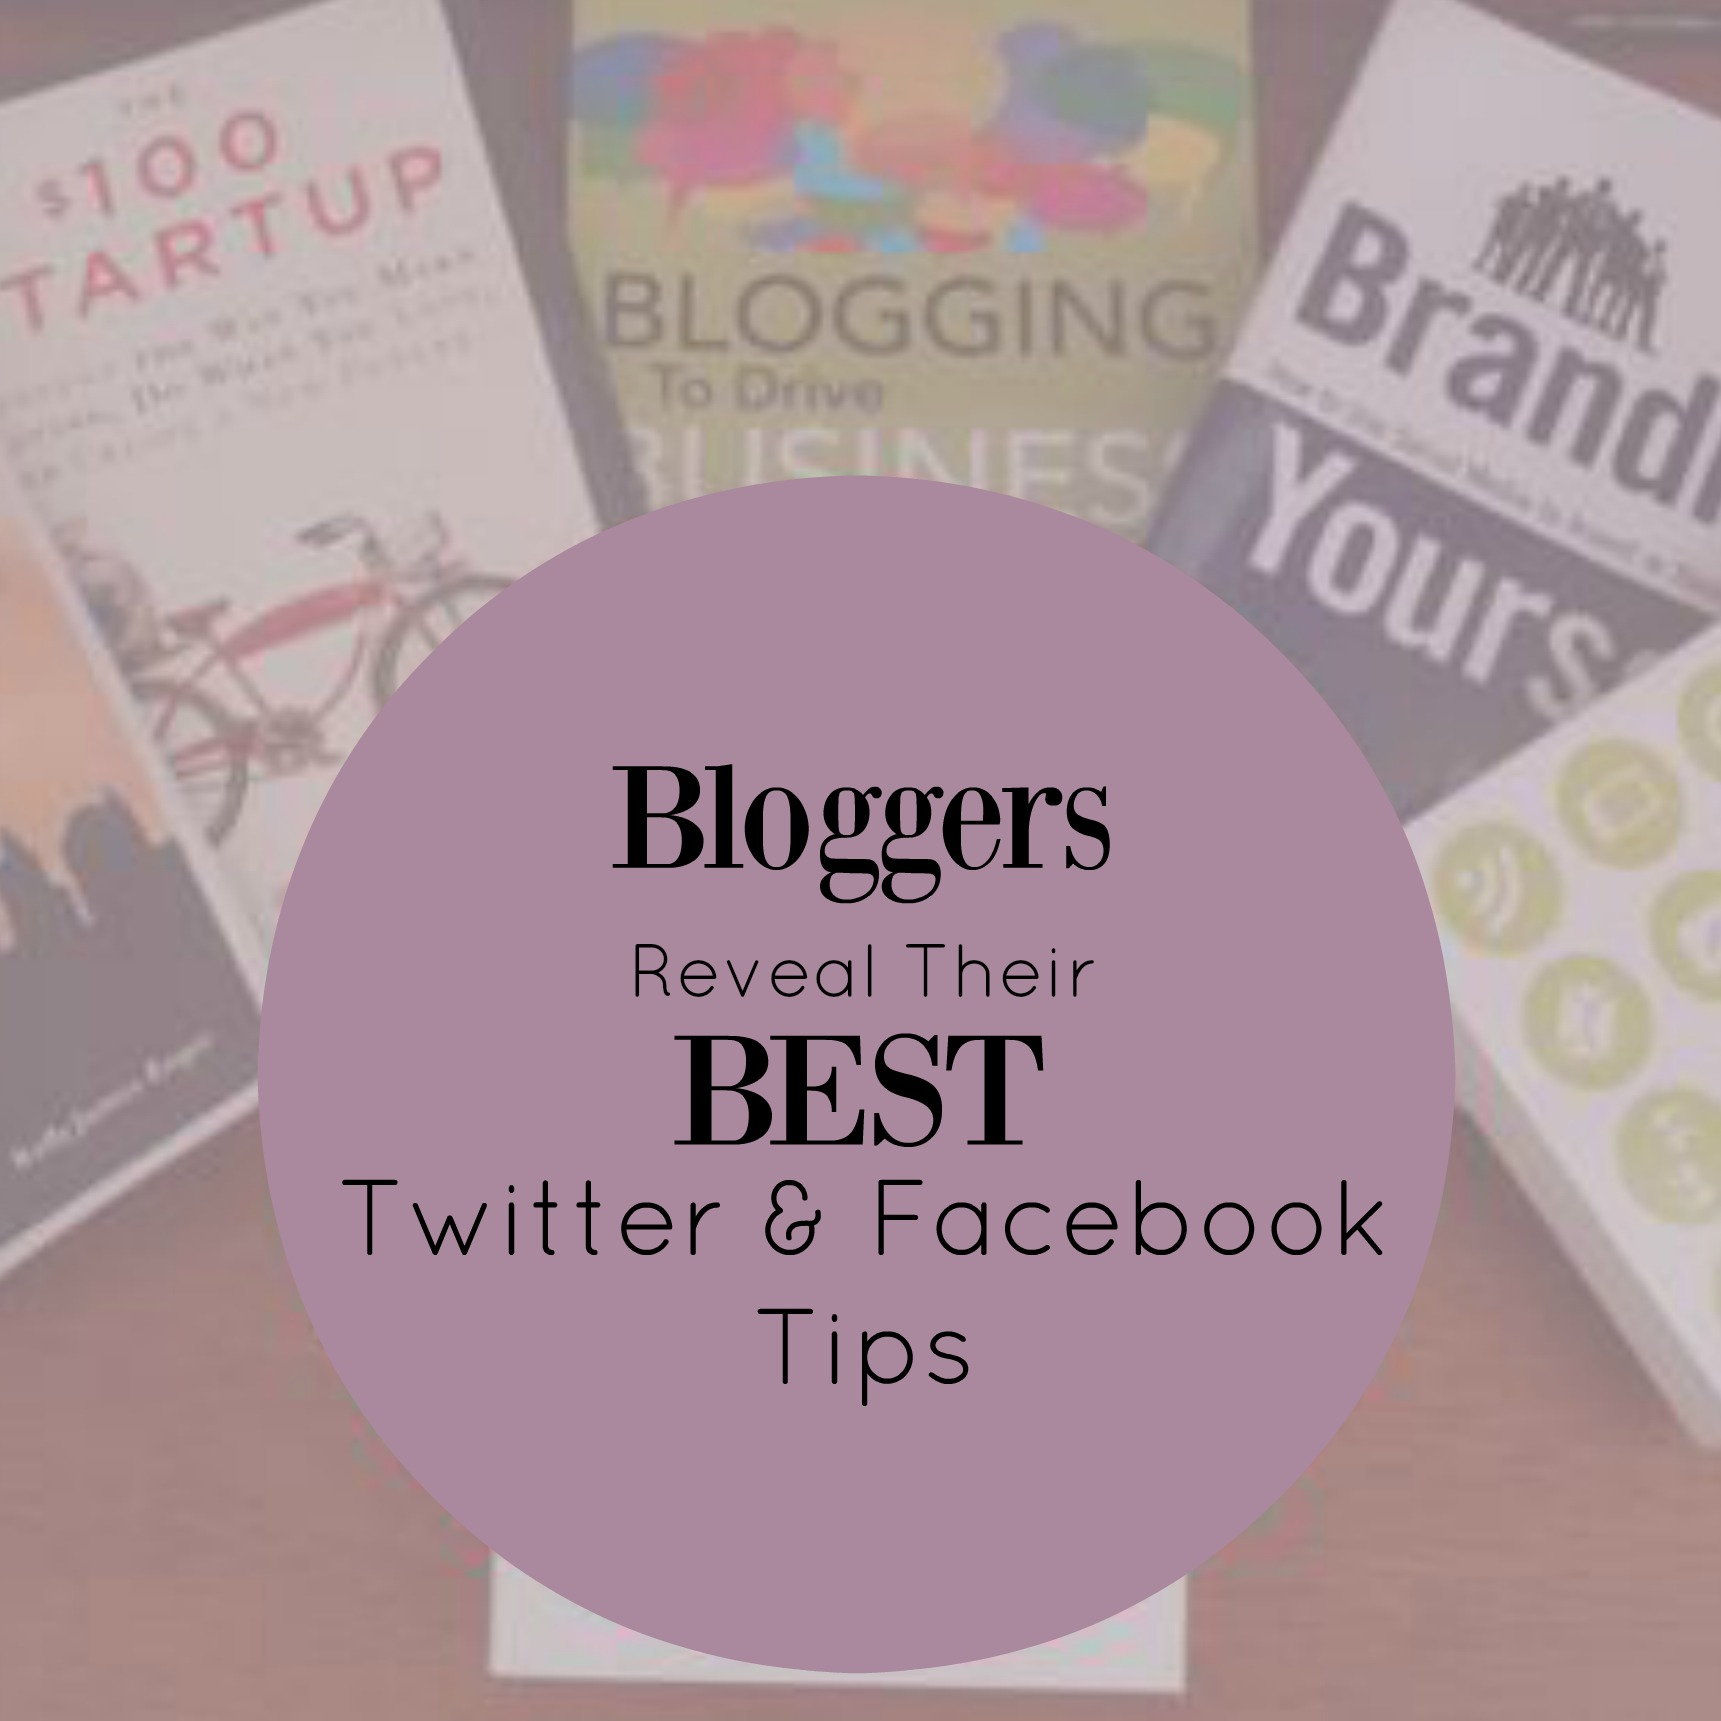 Blogger's Best Twitter & Facebook Tips